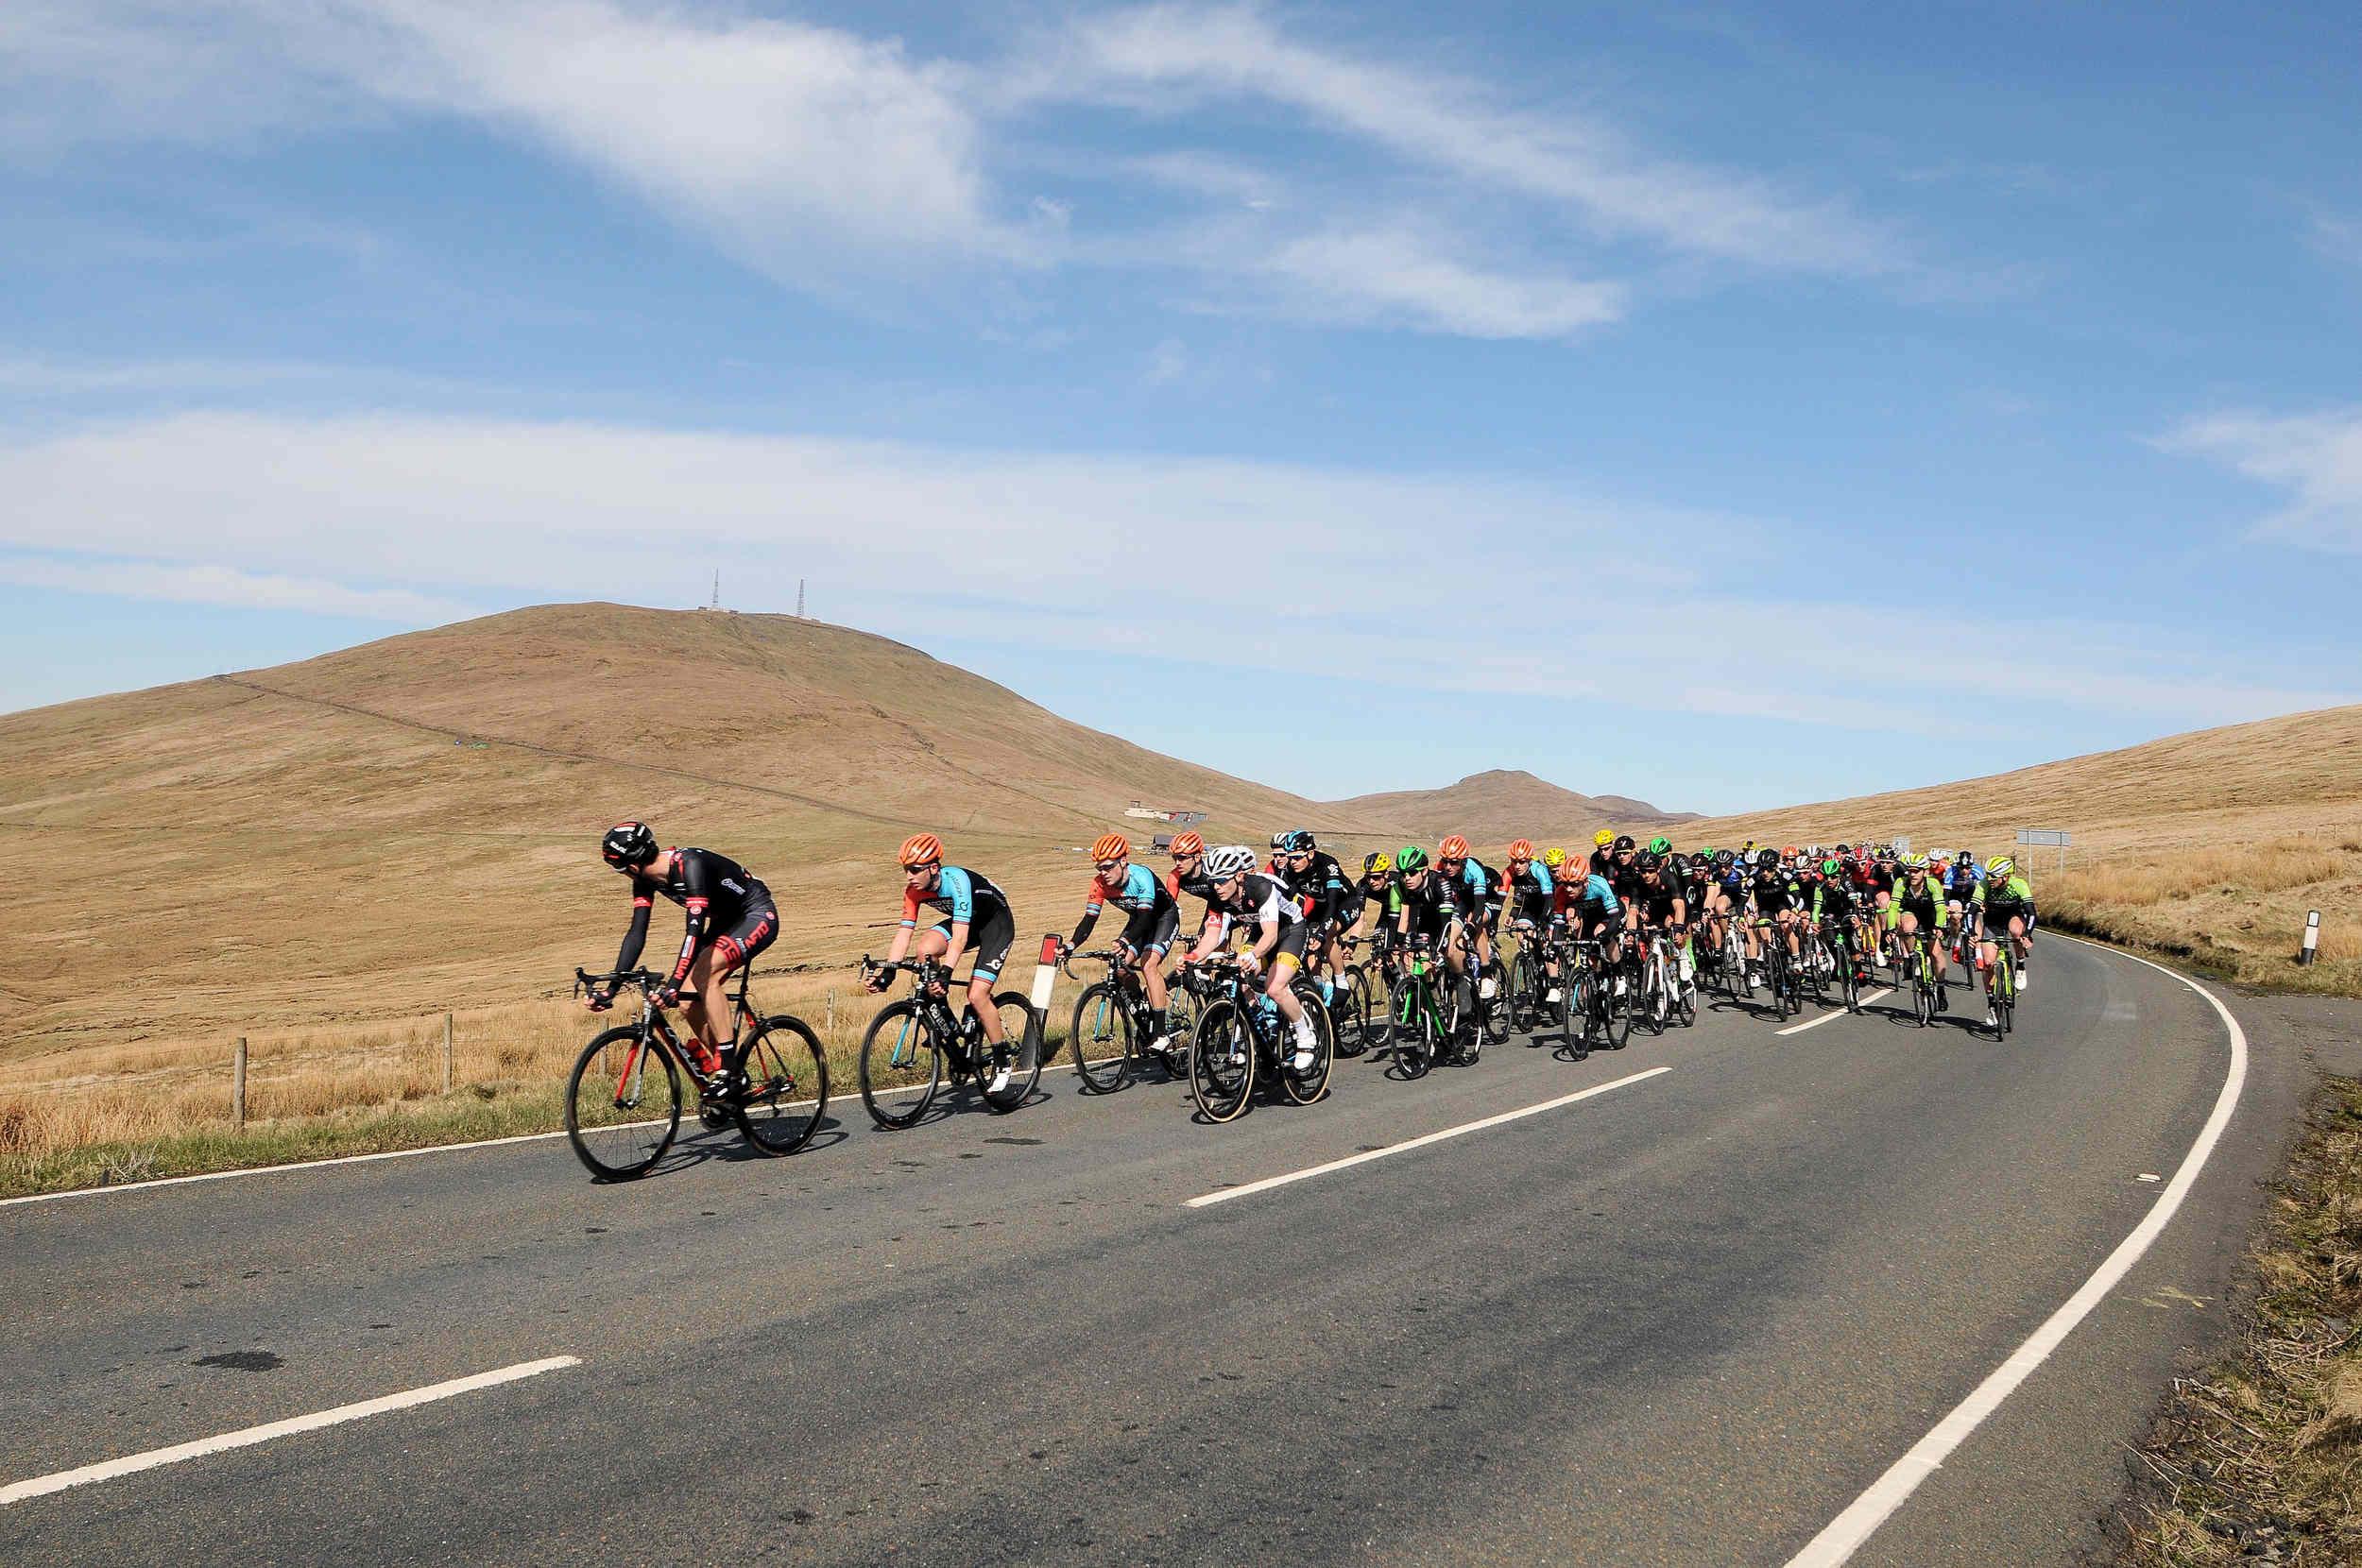 The Manx International Cycle GP 2016